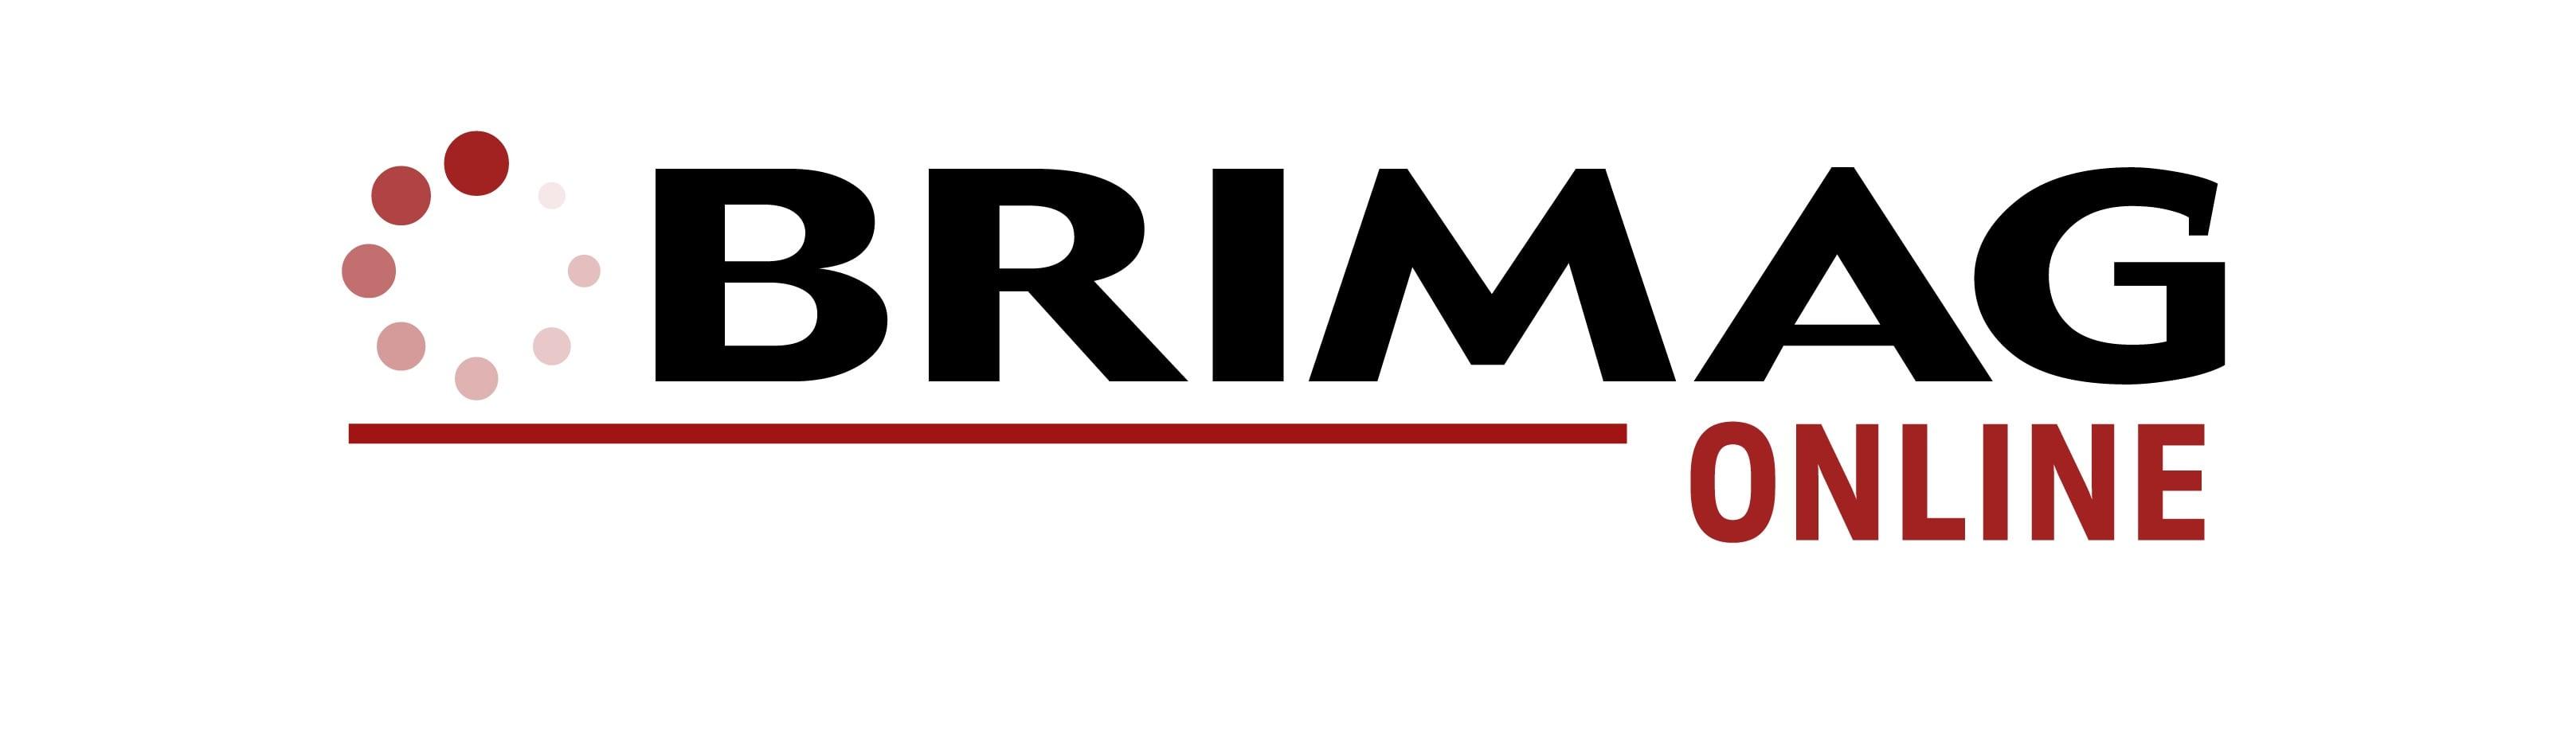 Brimag Online